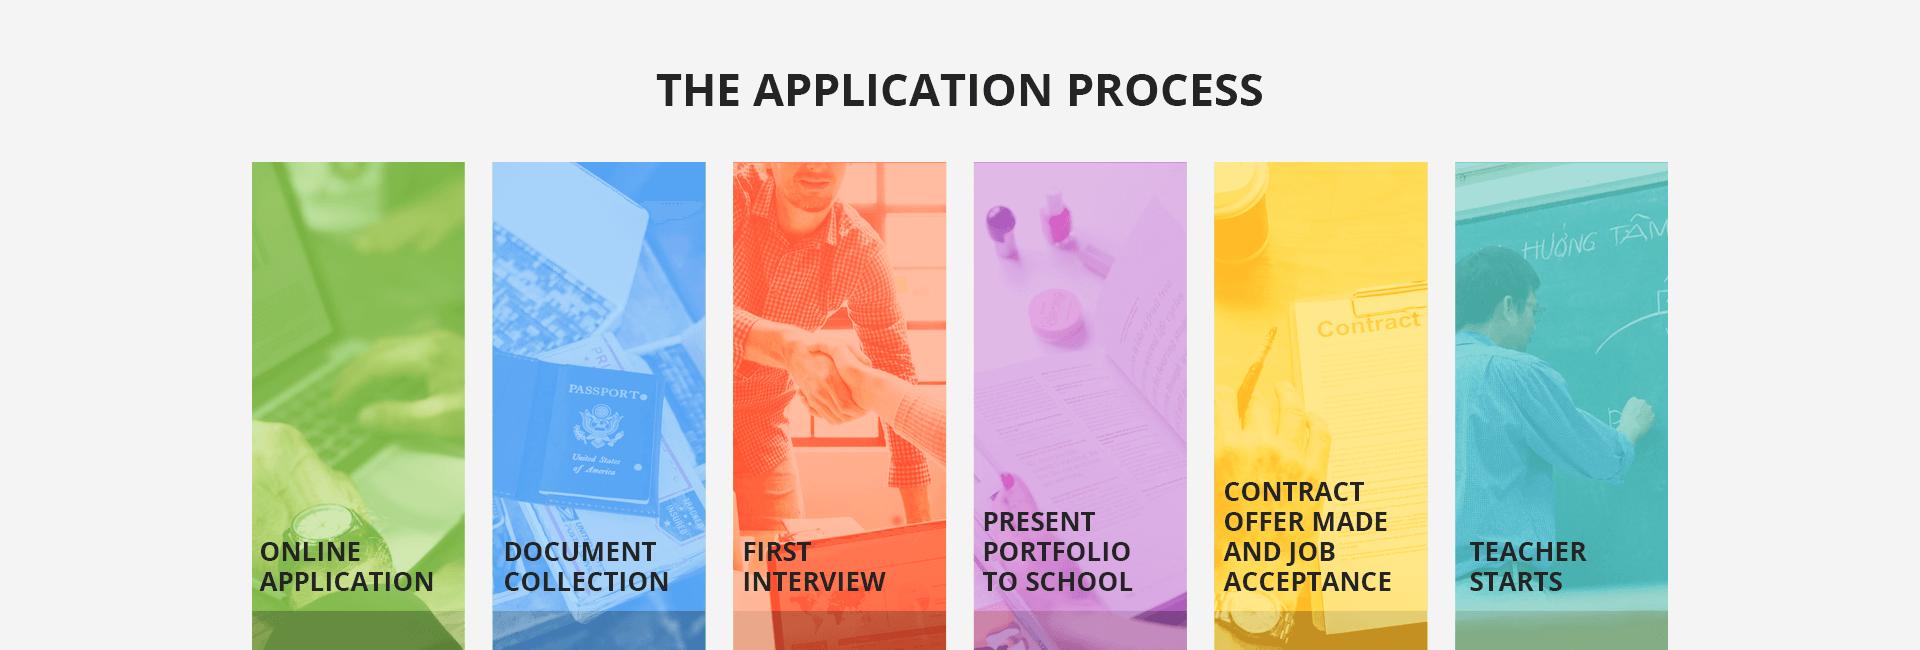 ApplicationProcess